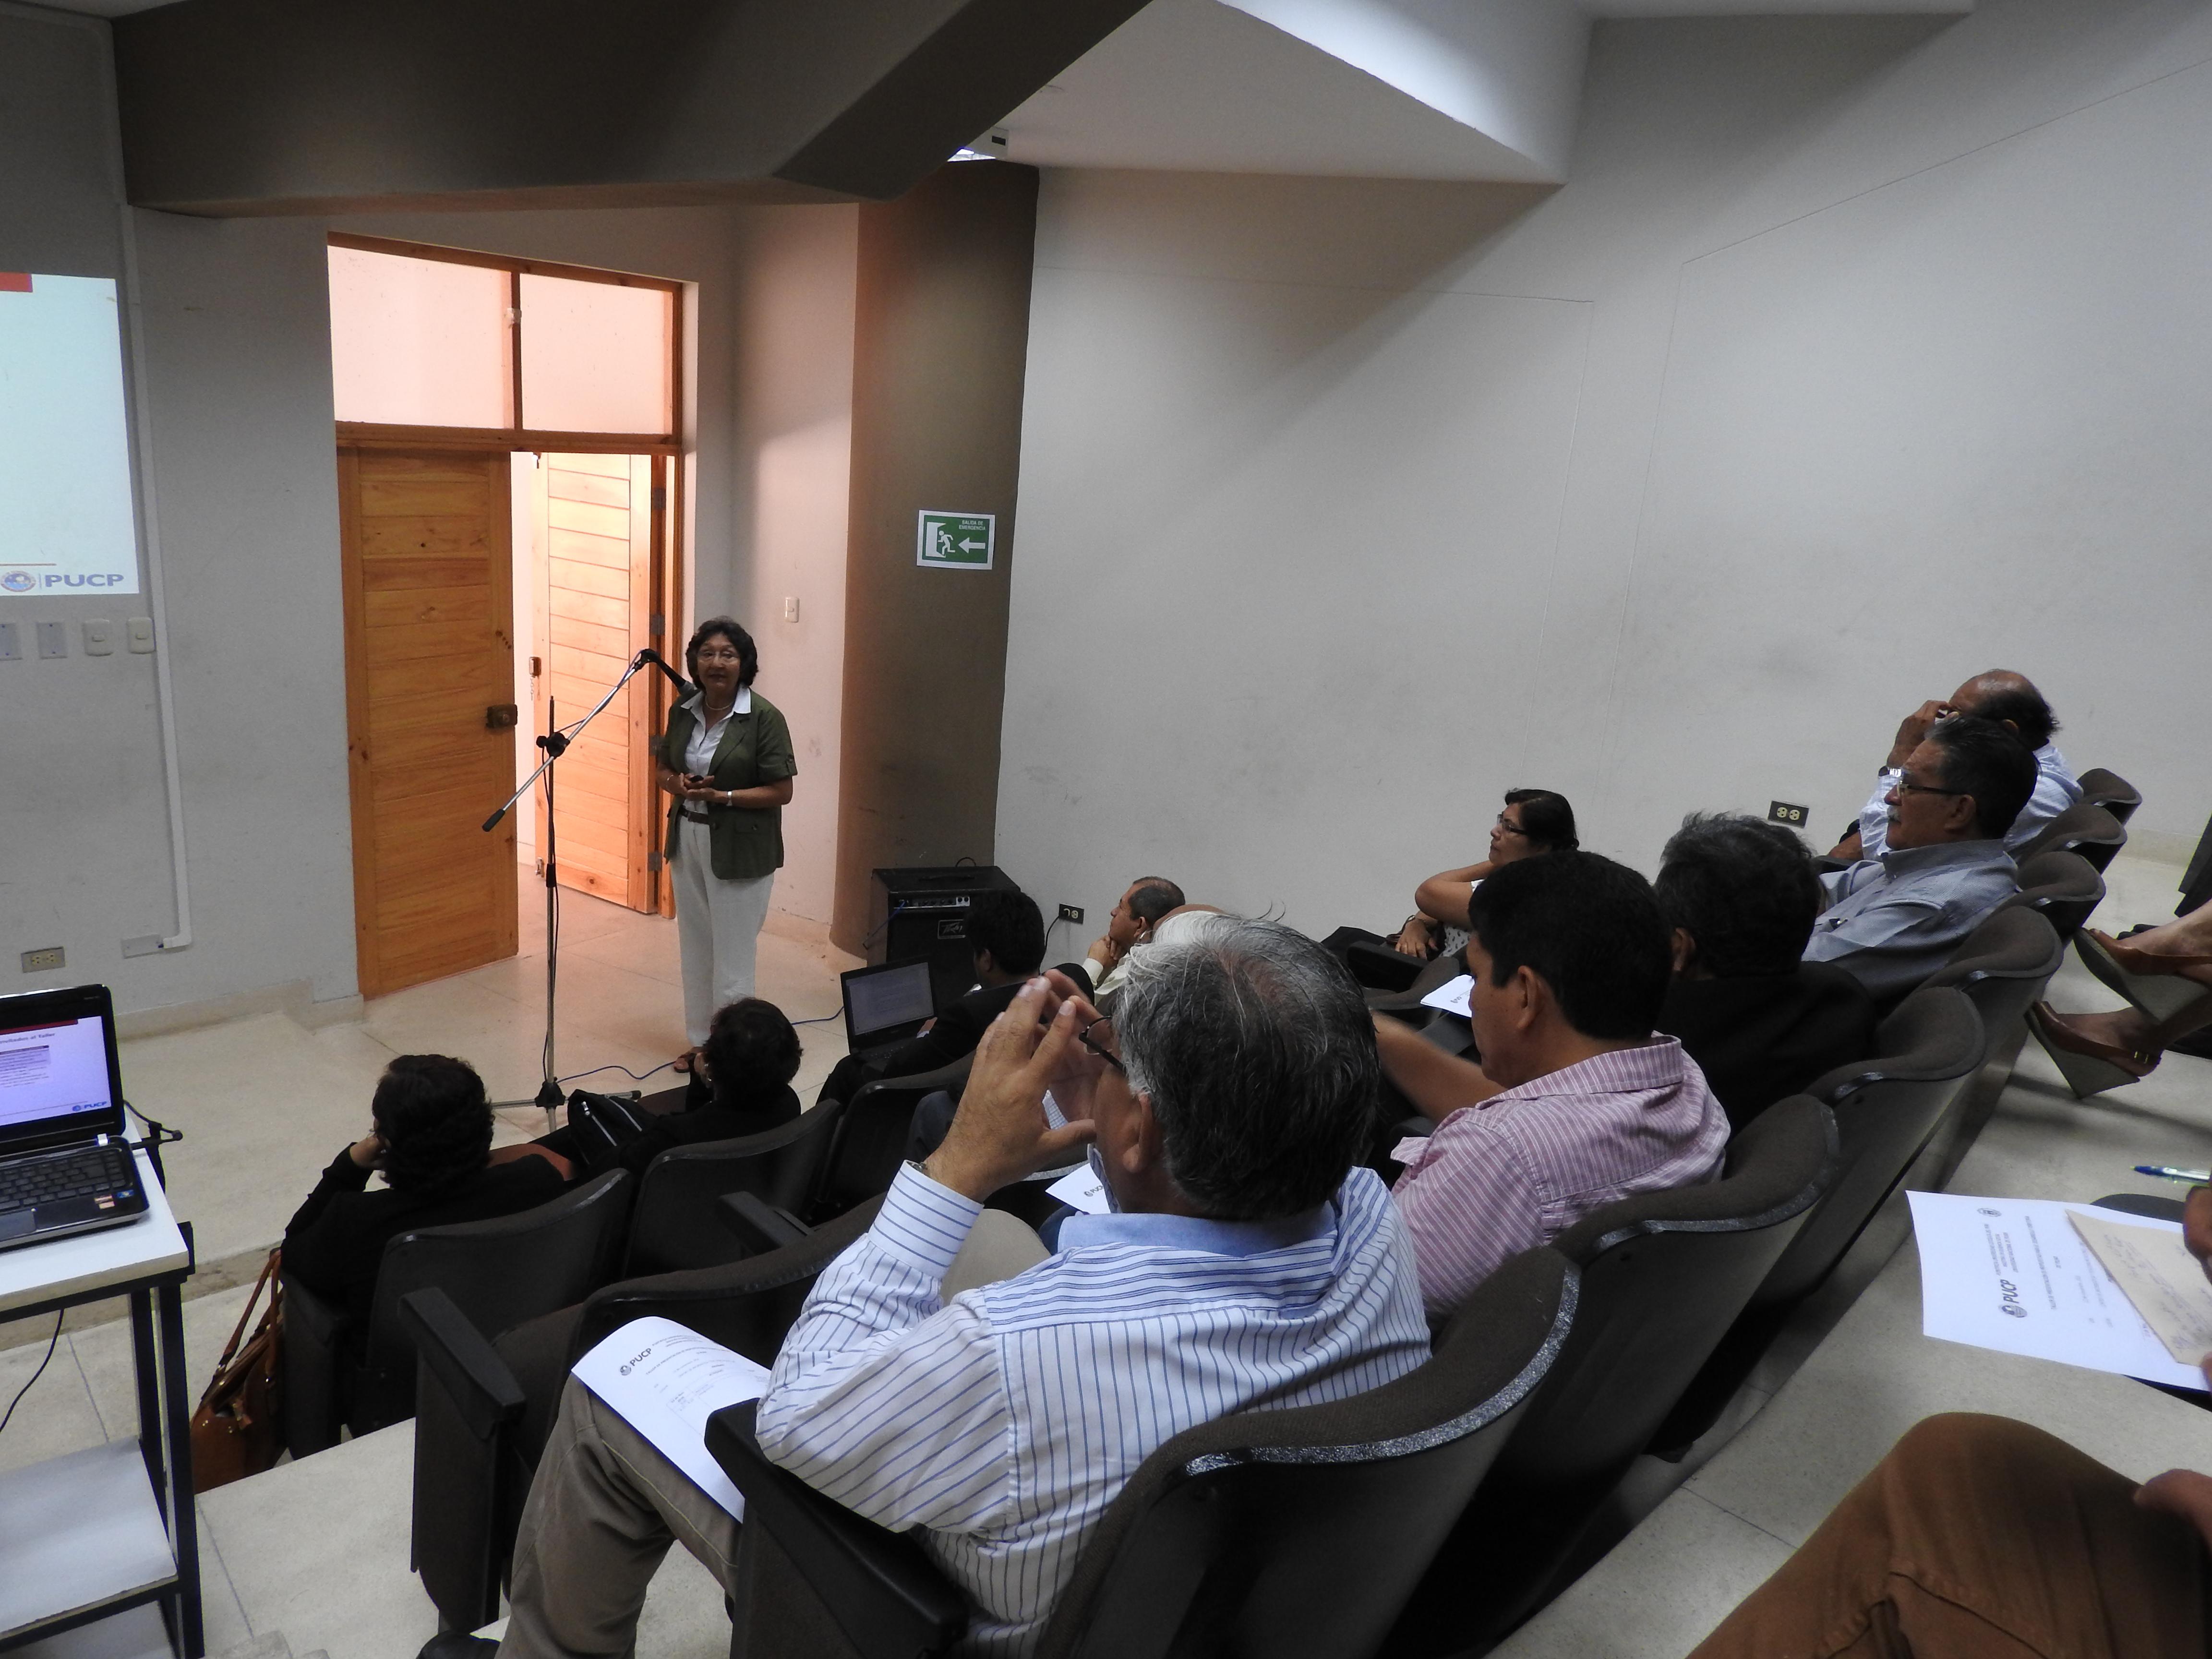 Exposición de la docente Mg. Rita Zegarra (PUCP)